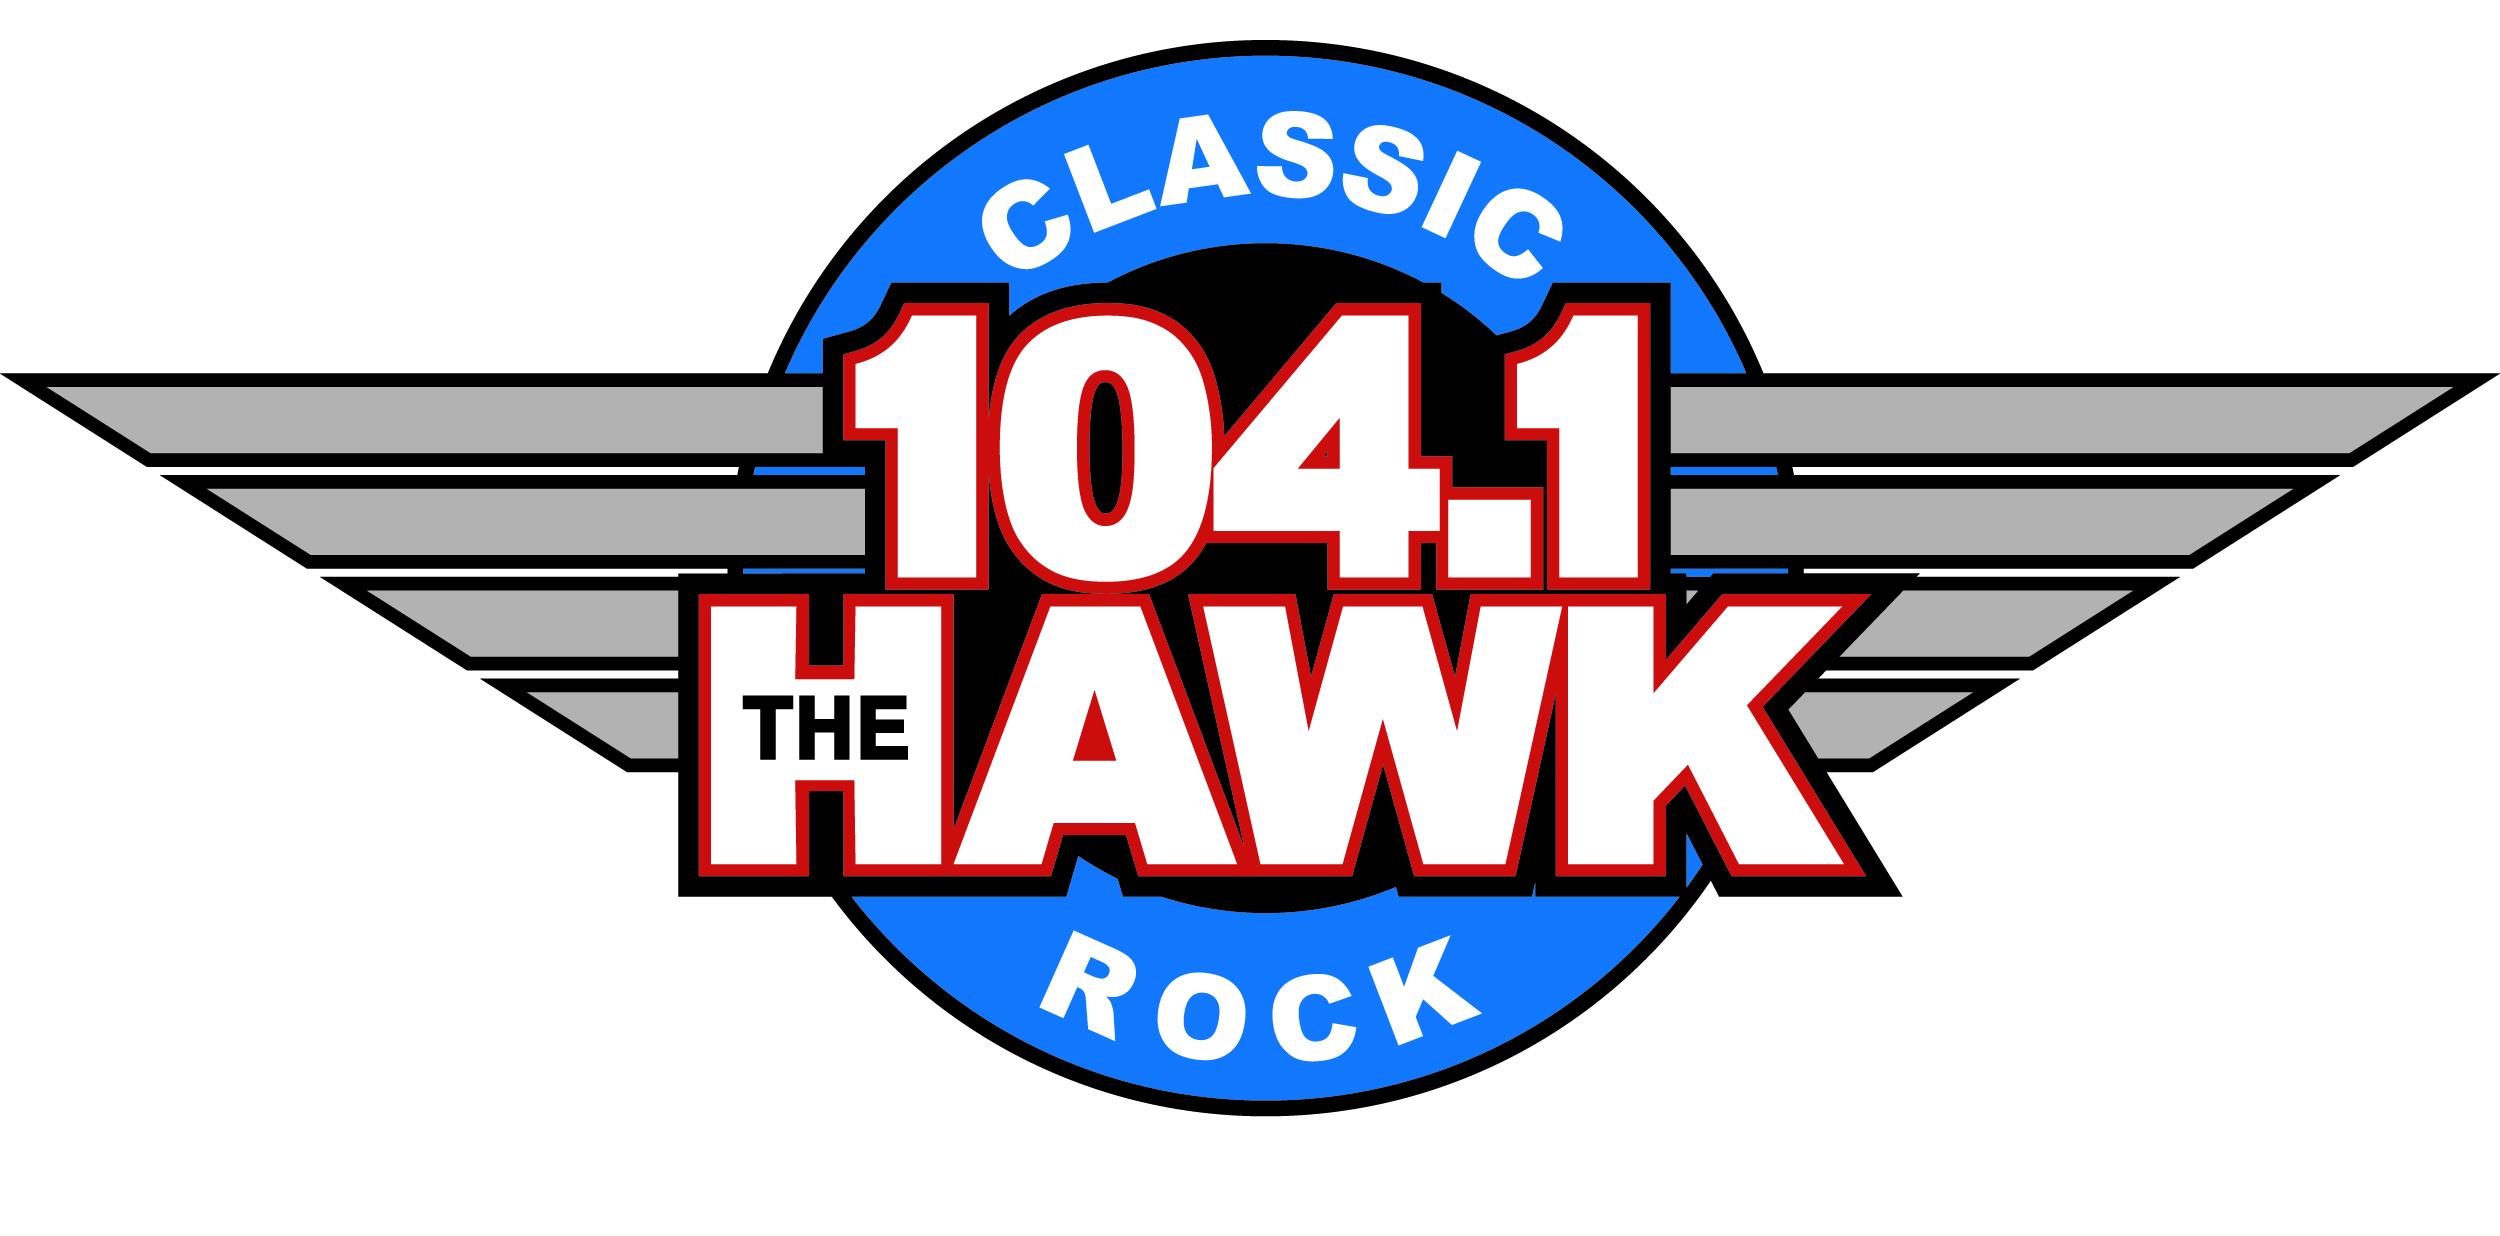 Hawk Logo big.jpg